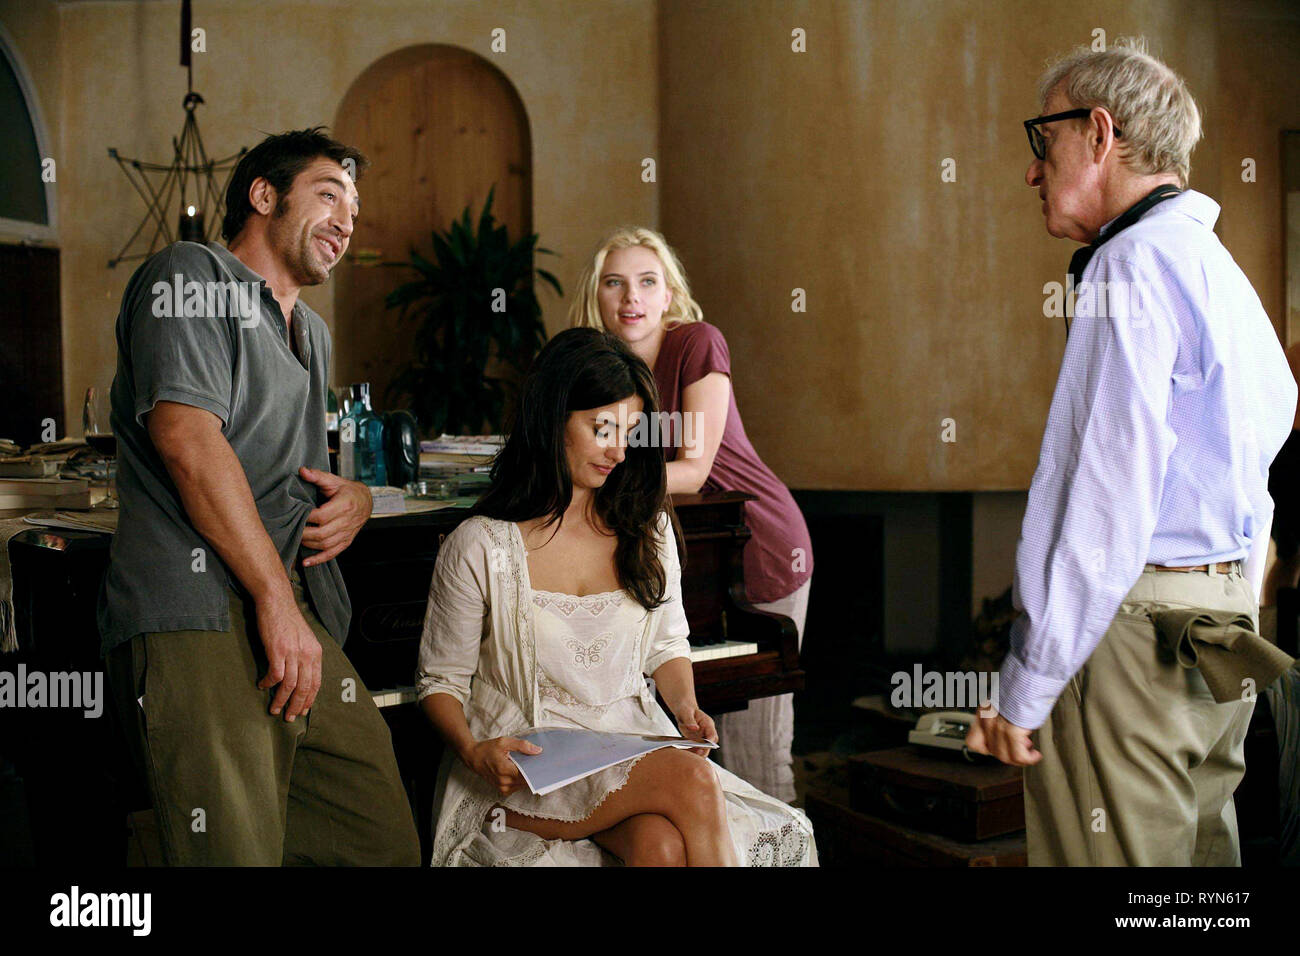 BARDEM,CRUZ,JOHANSSON,ALLEN, VICKY CRISTINA BARCELONA, 2008 - Stock Image